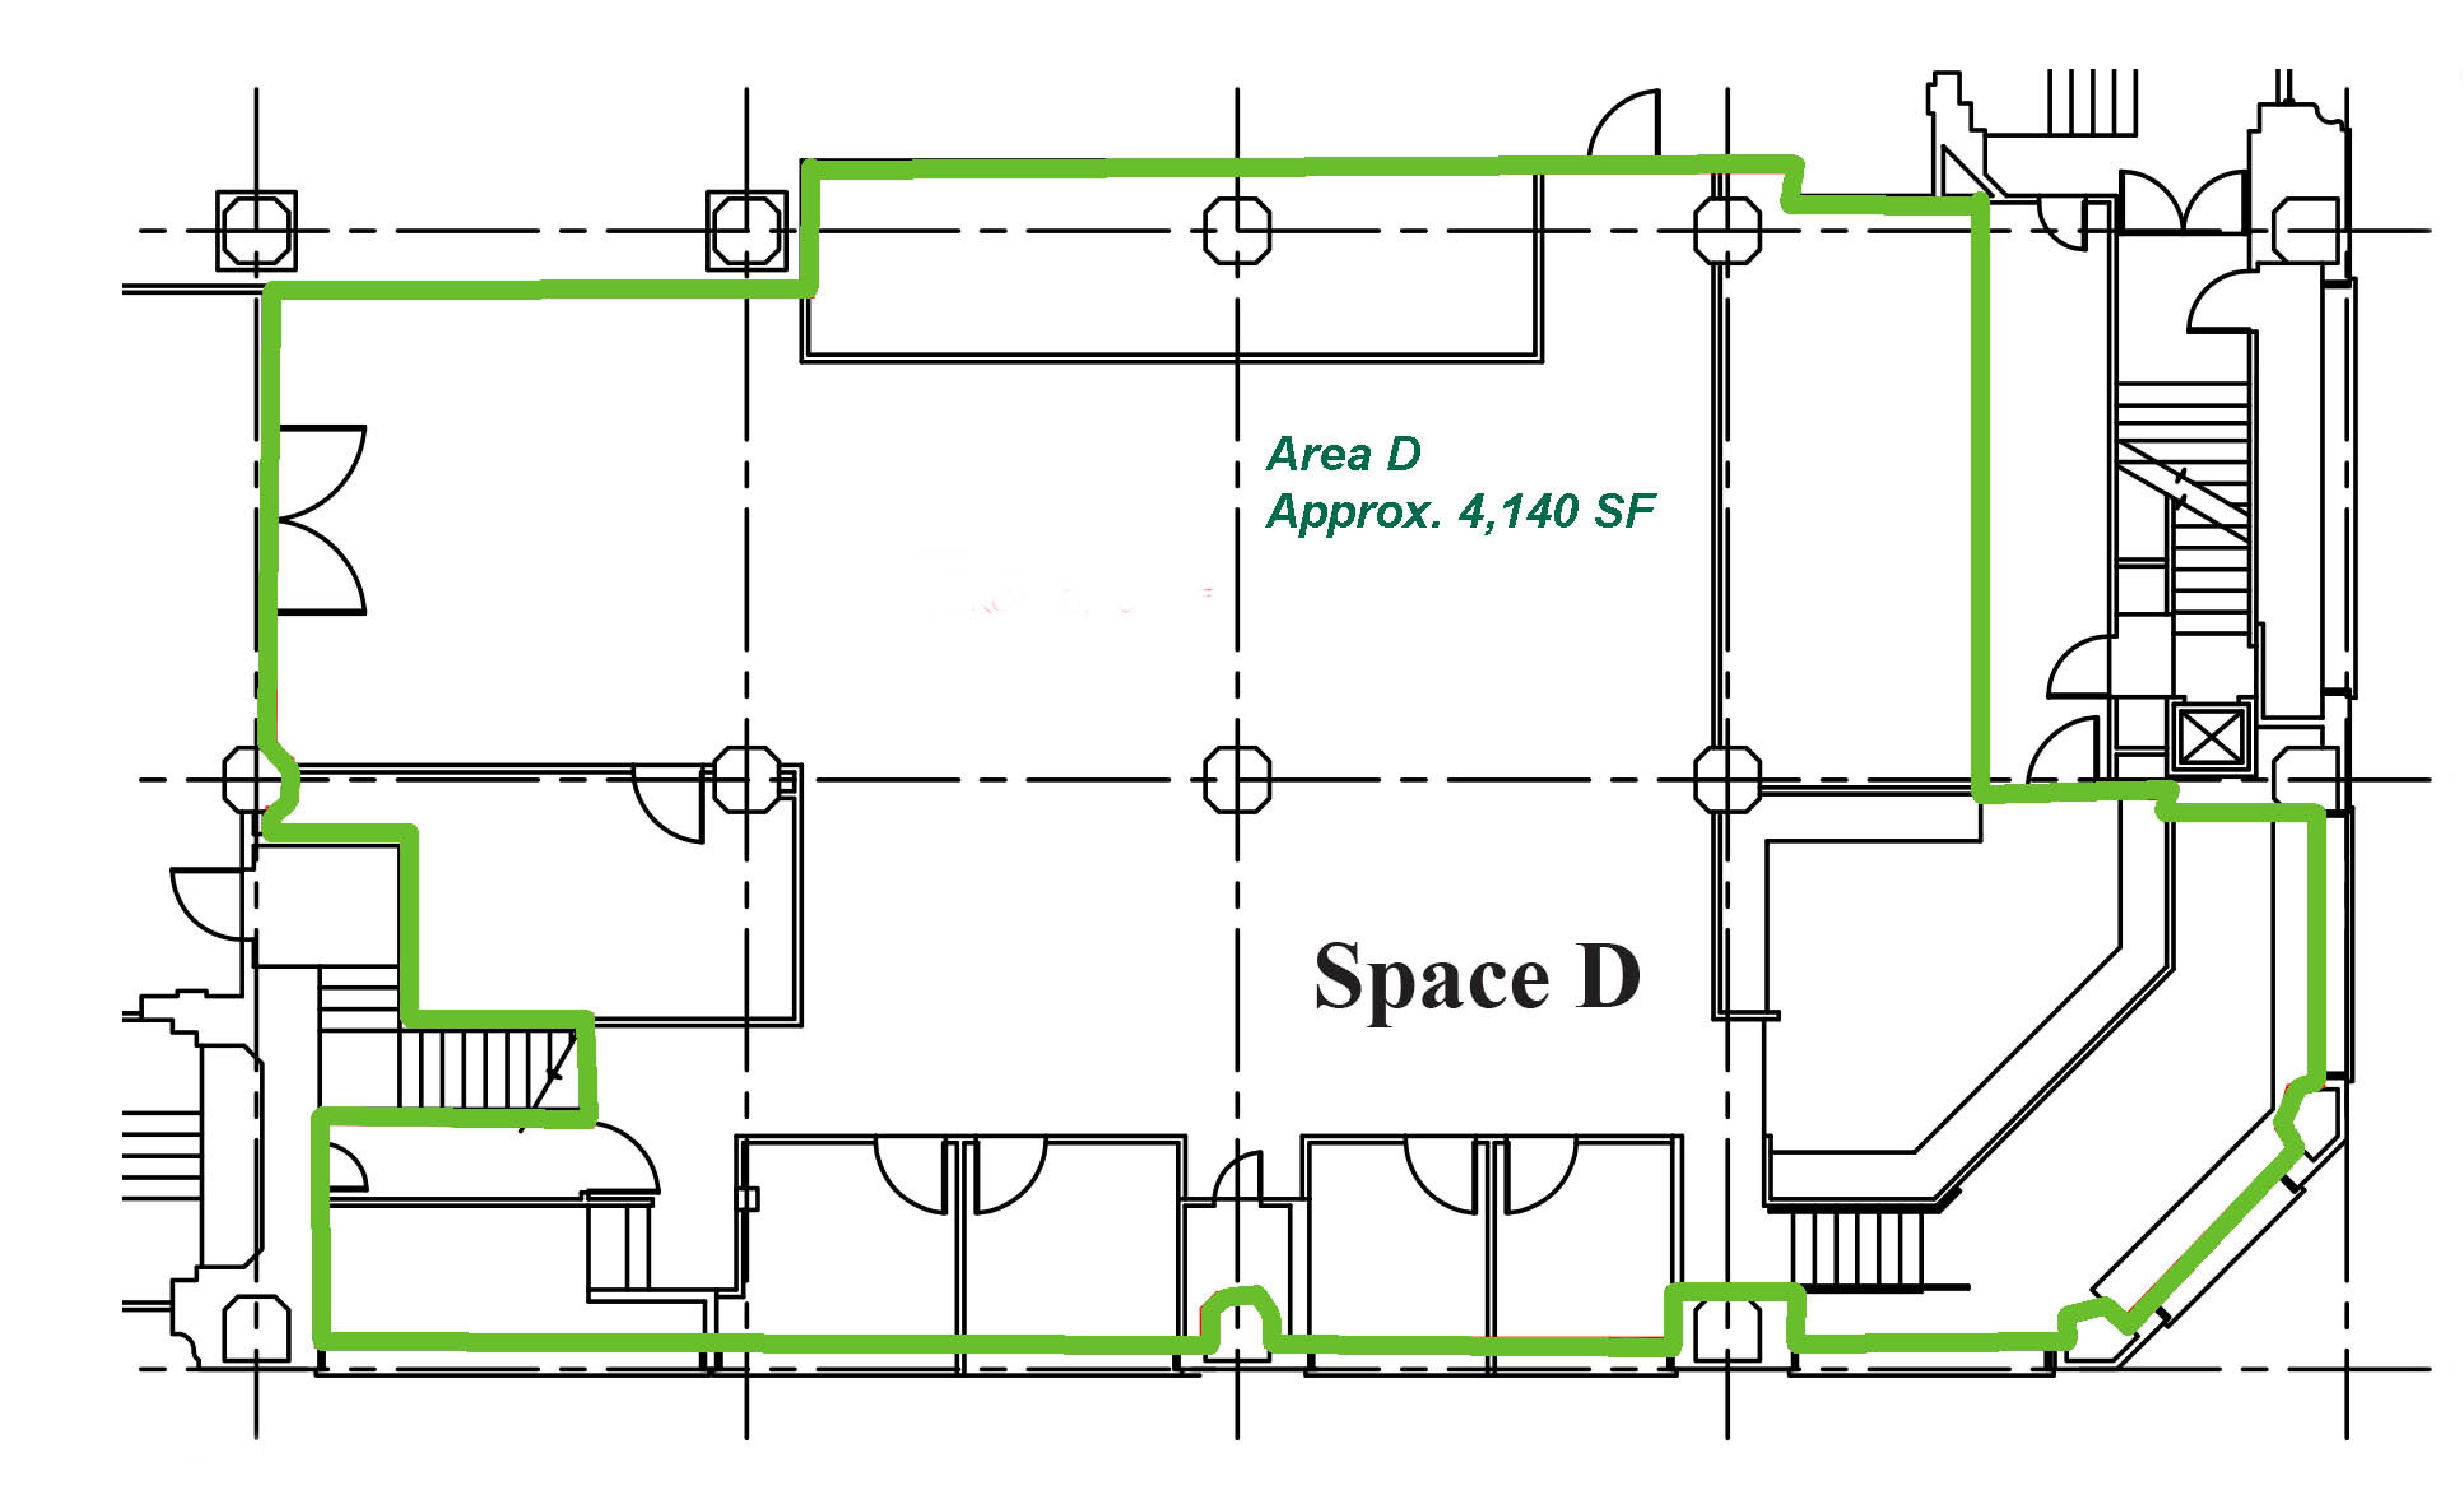 UNT - 1900 Elm Street: site plan